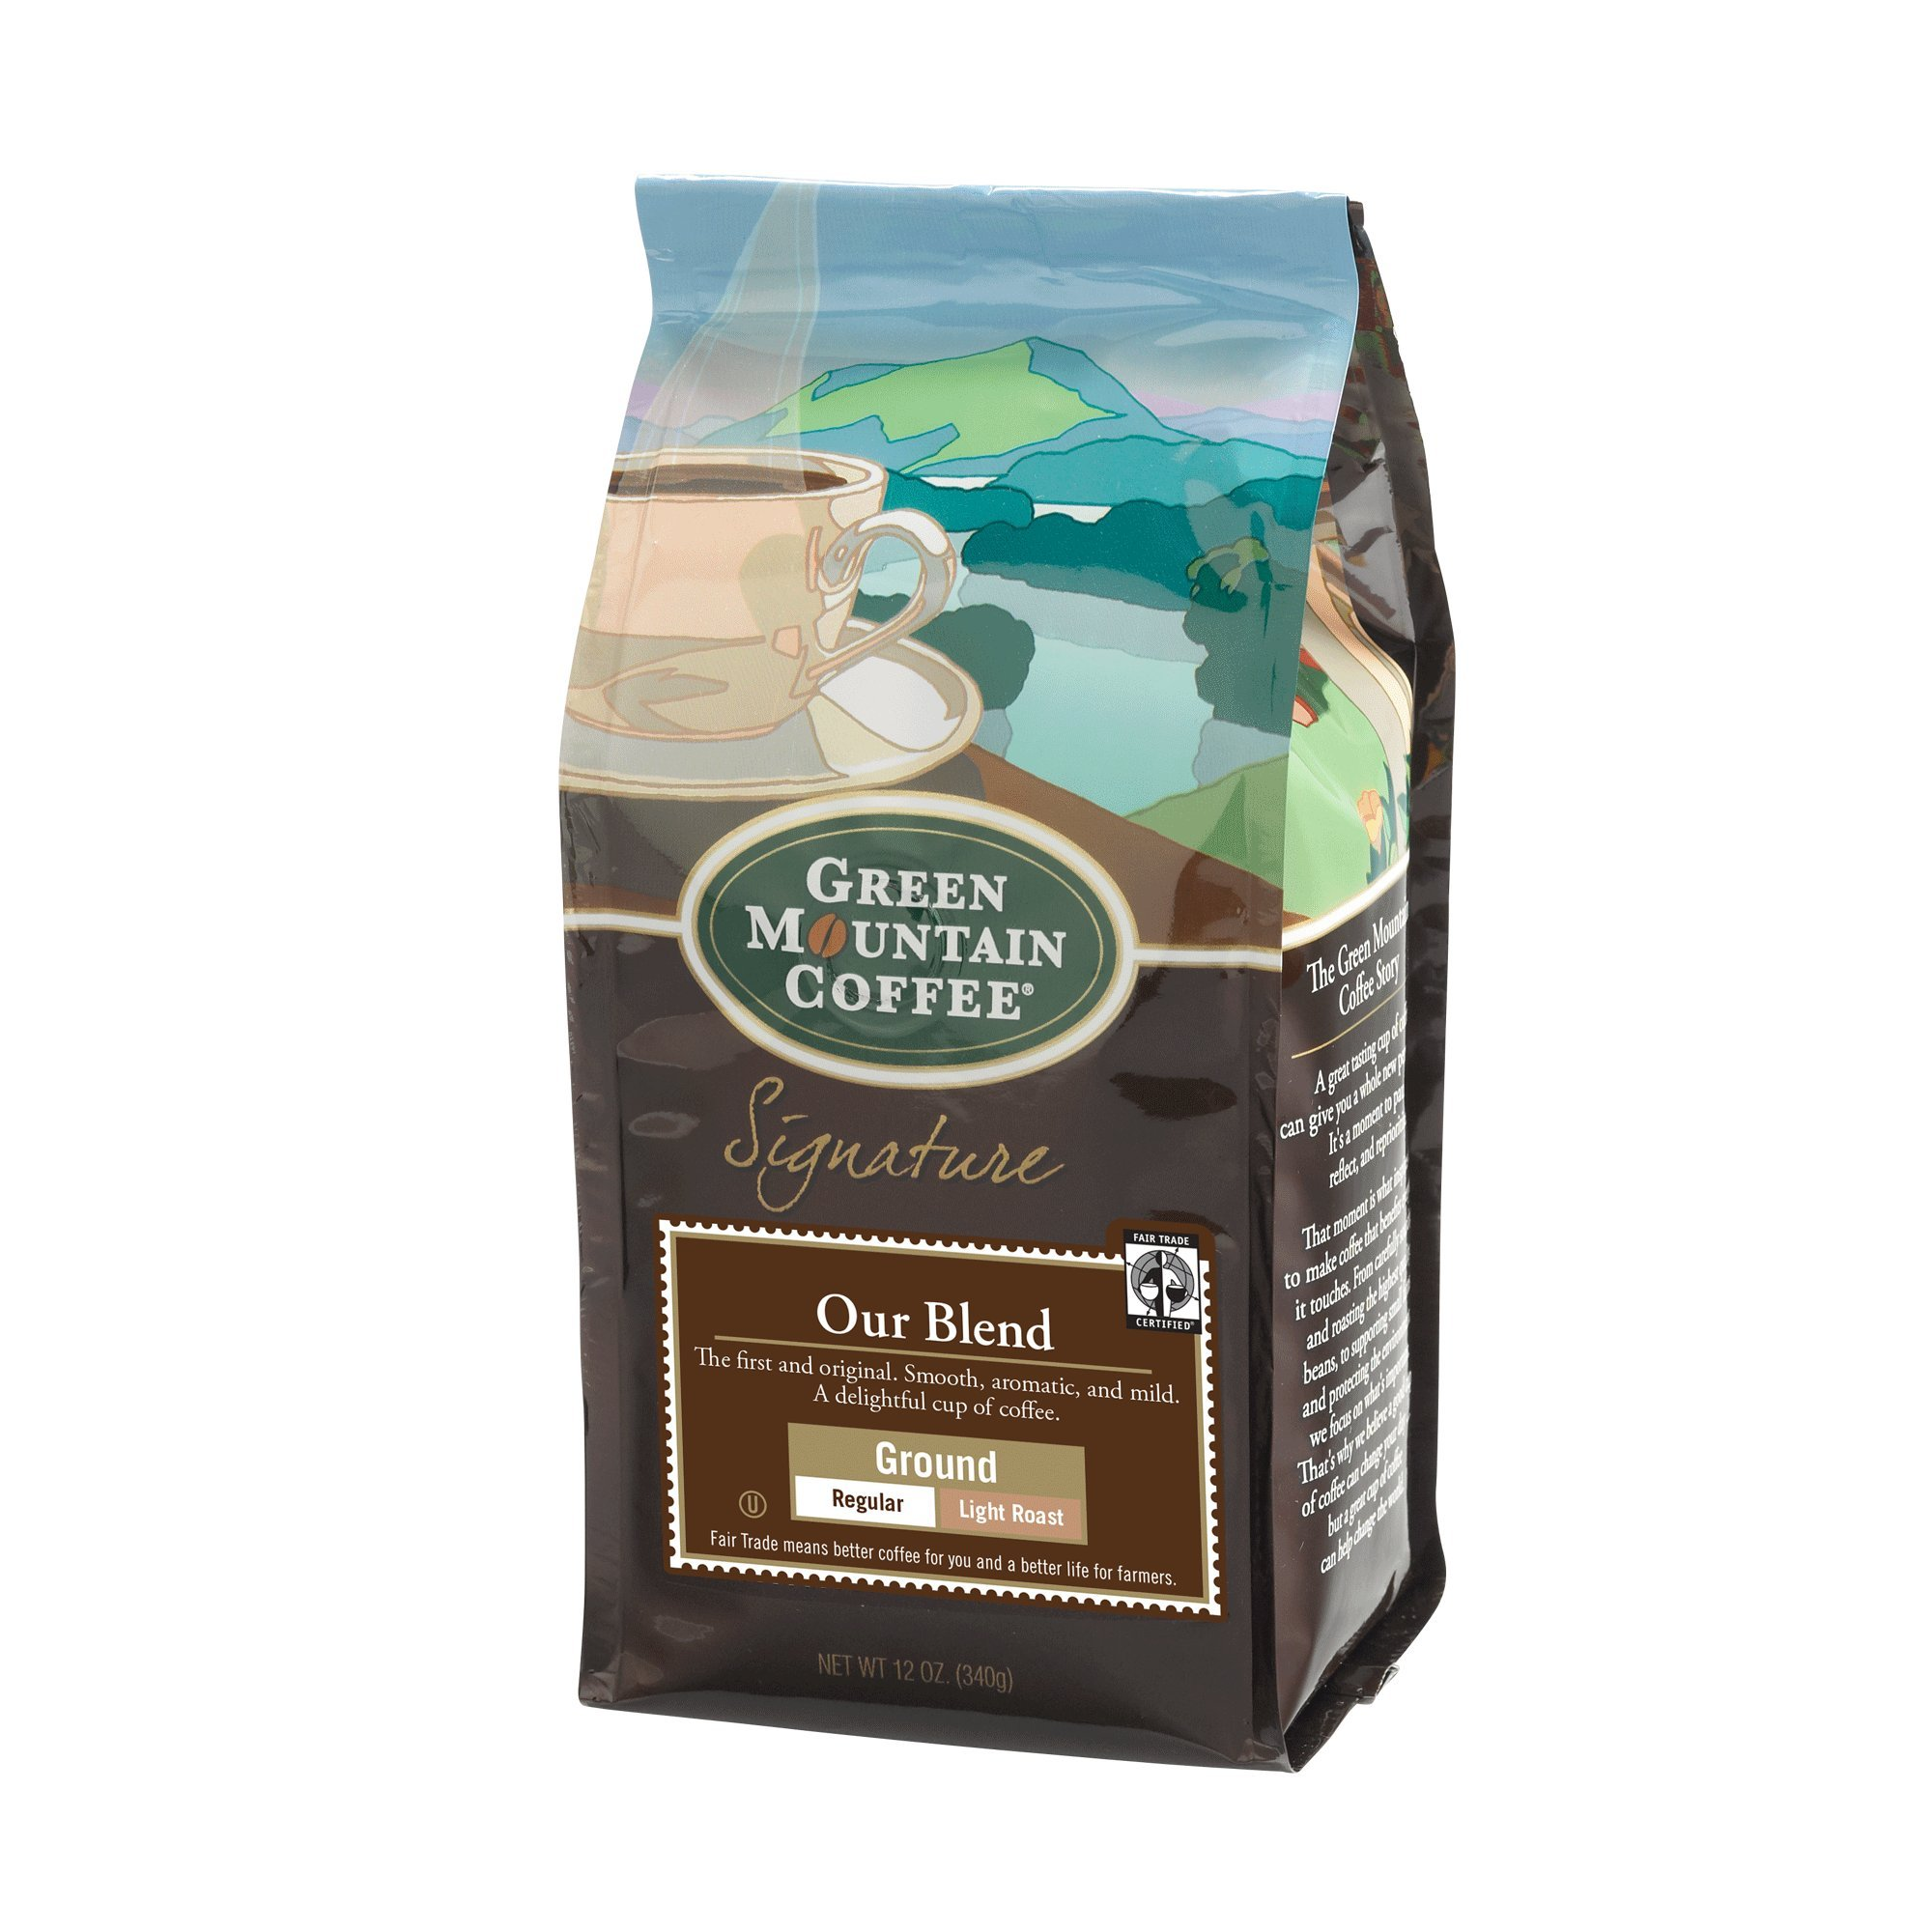 Green Mountain Coffee Our Blend, 12 Ounces